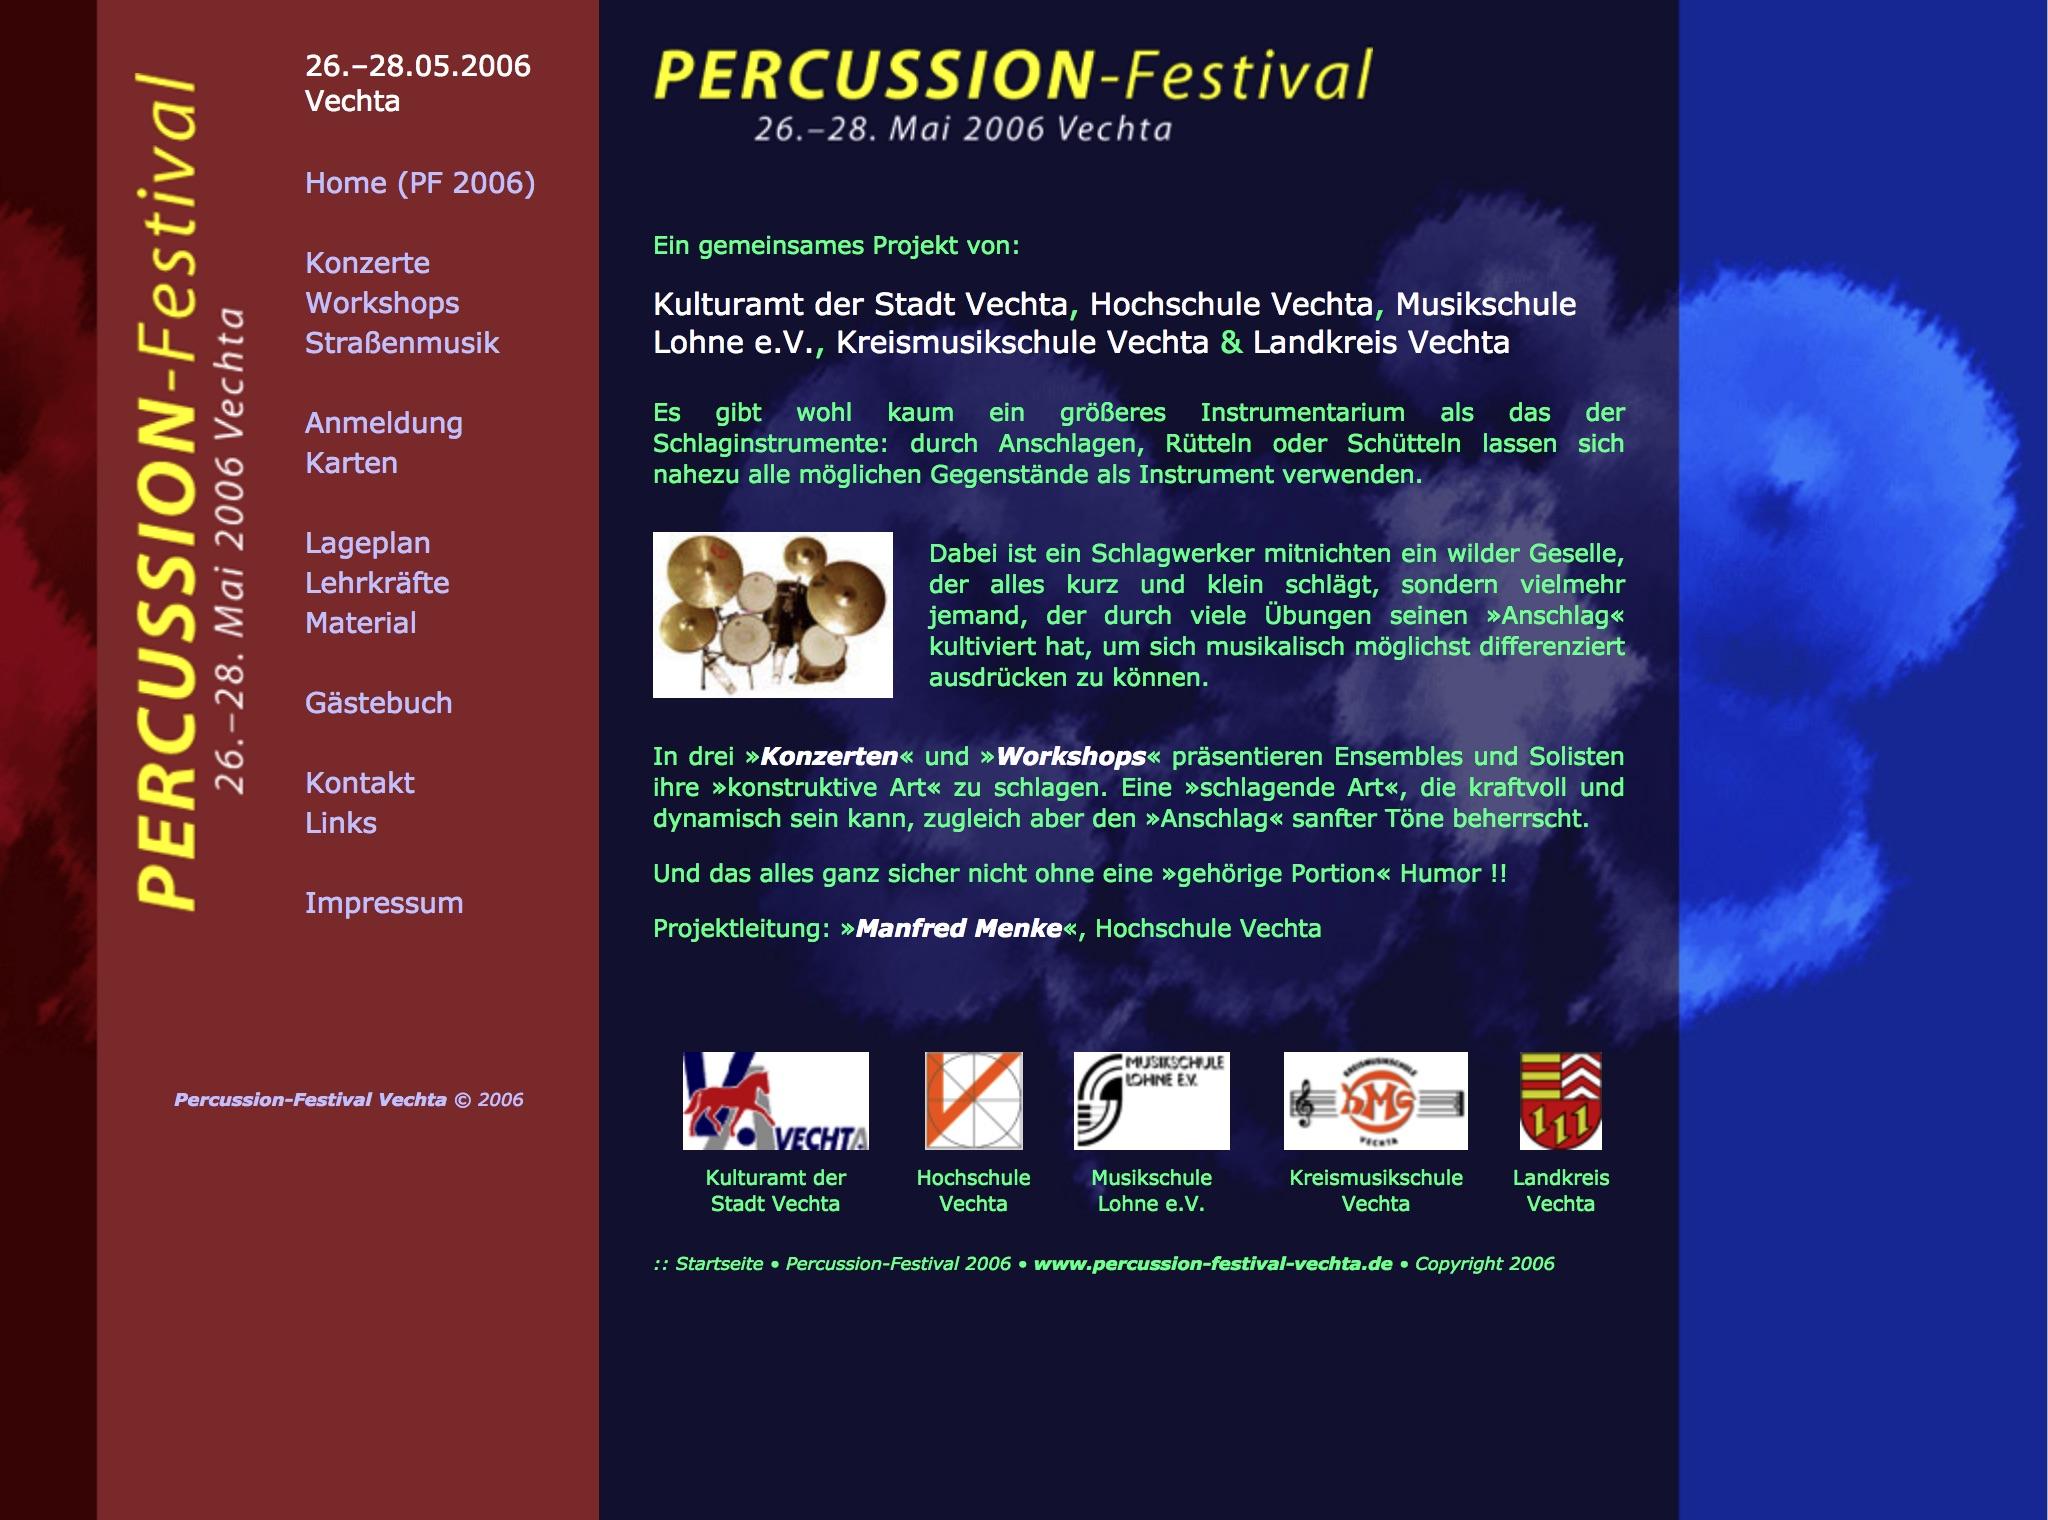 Homepage PFV 2006